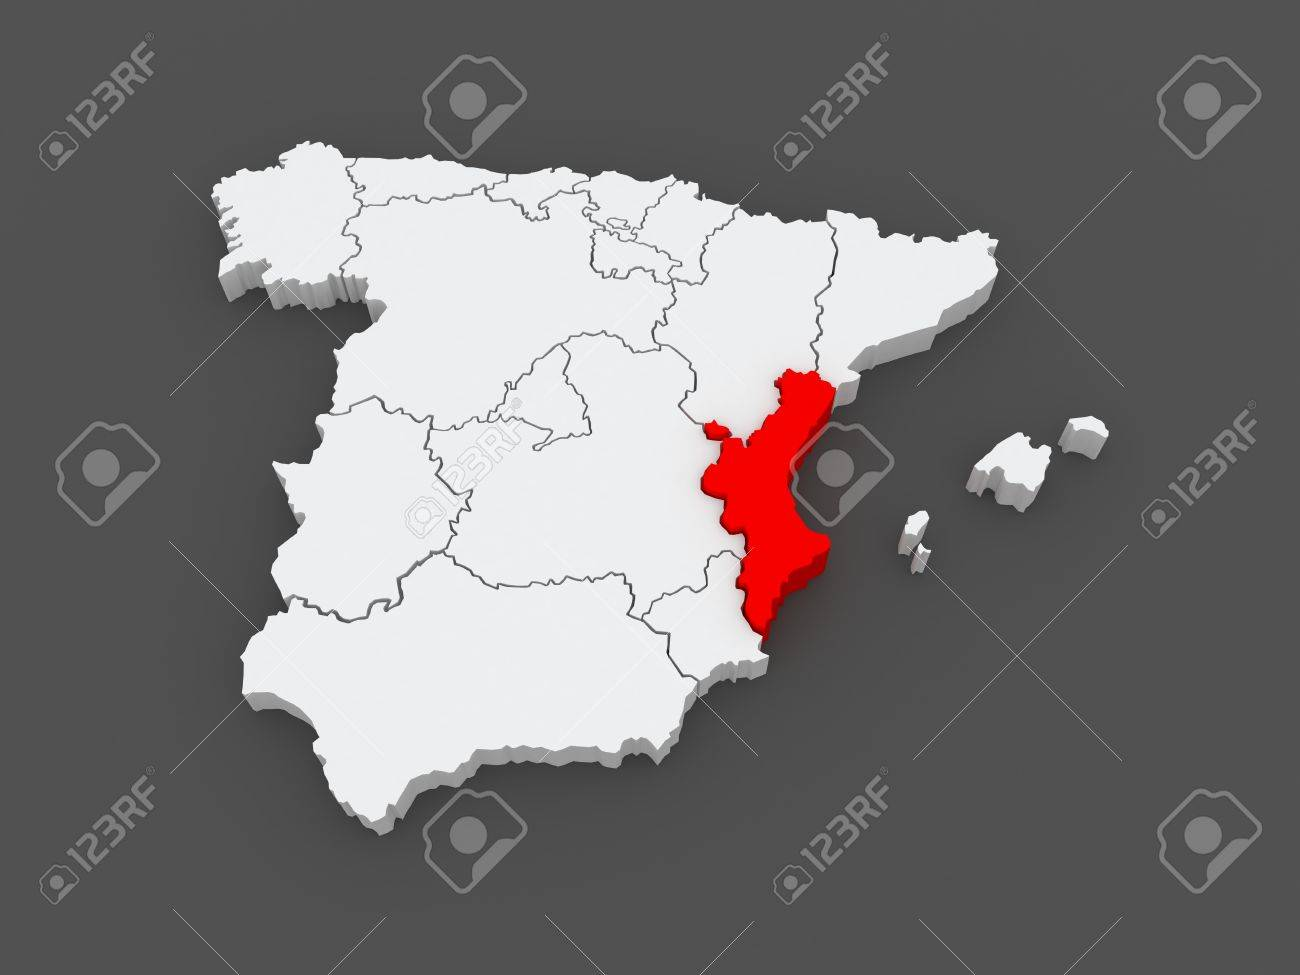 Mapa De Valencia España.Mapa De Valencia Espana 3d